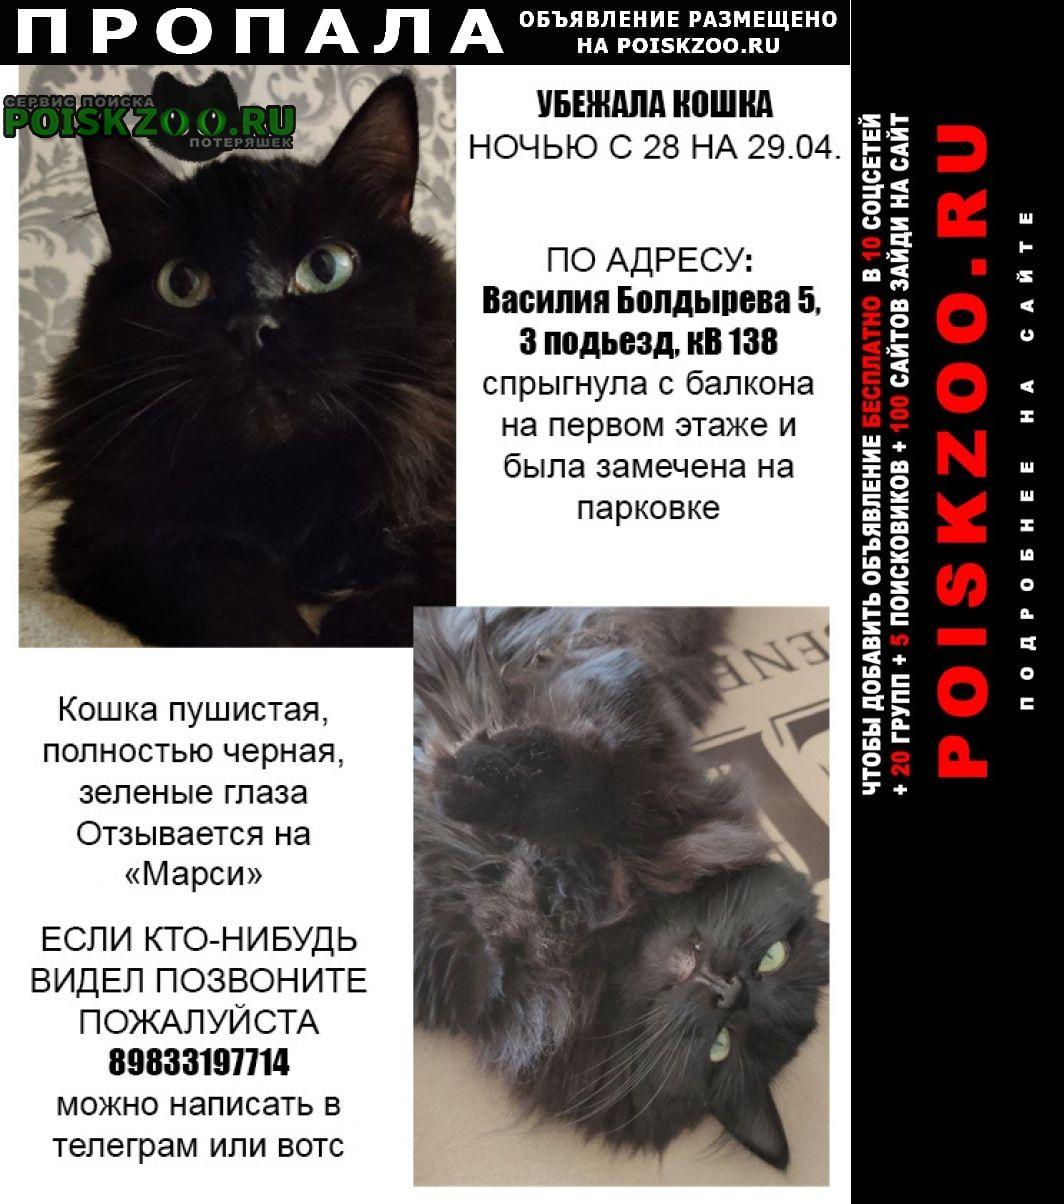 Пропала кошка в ночь с 28.04 на 29.04 Томск